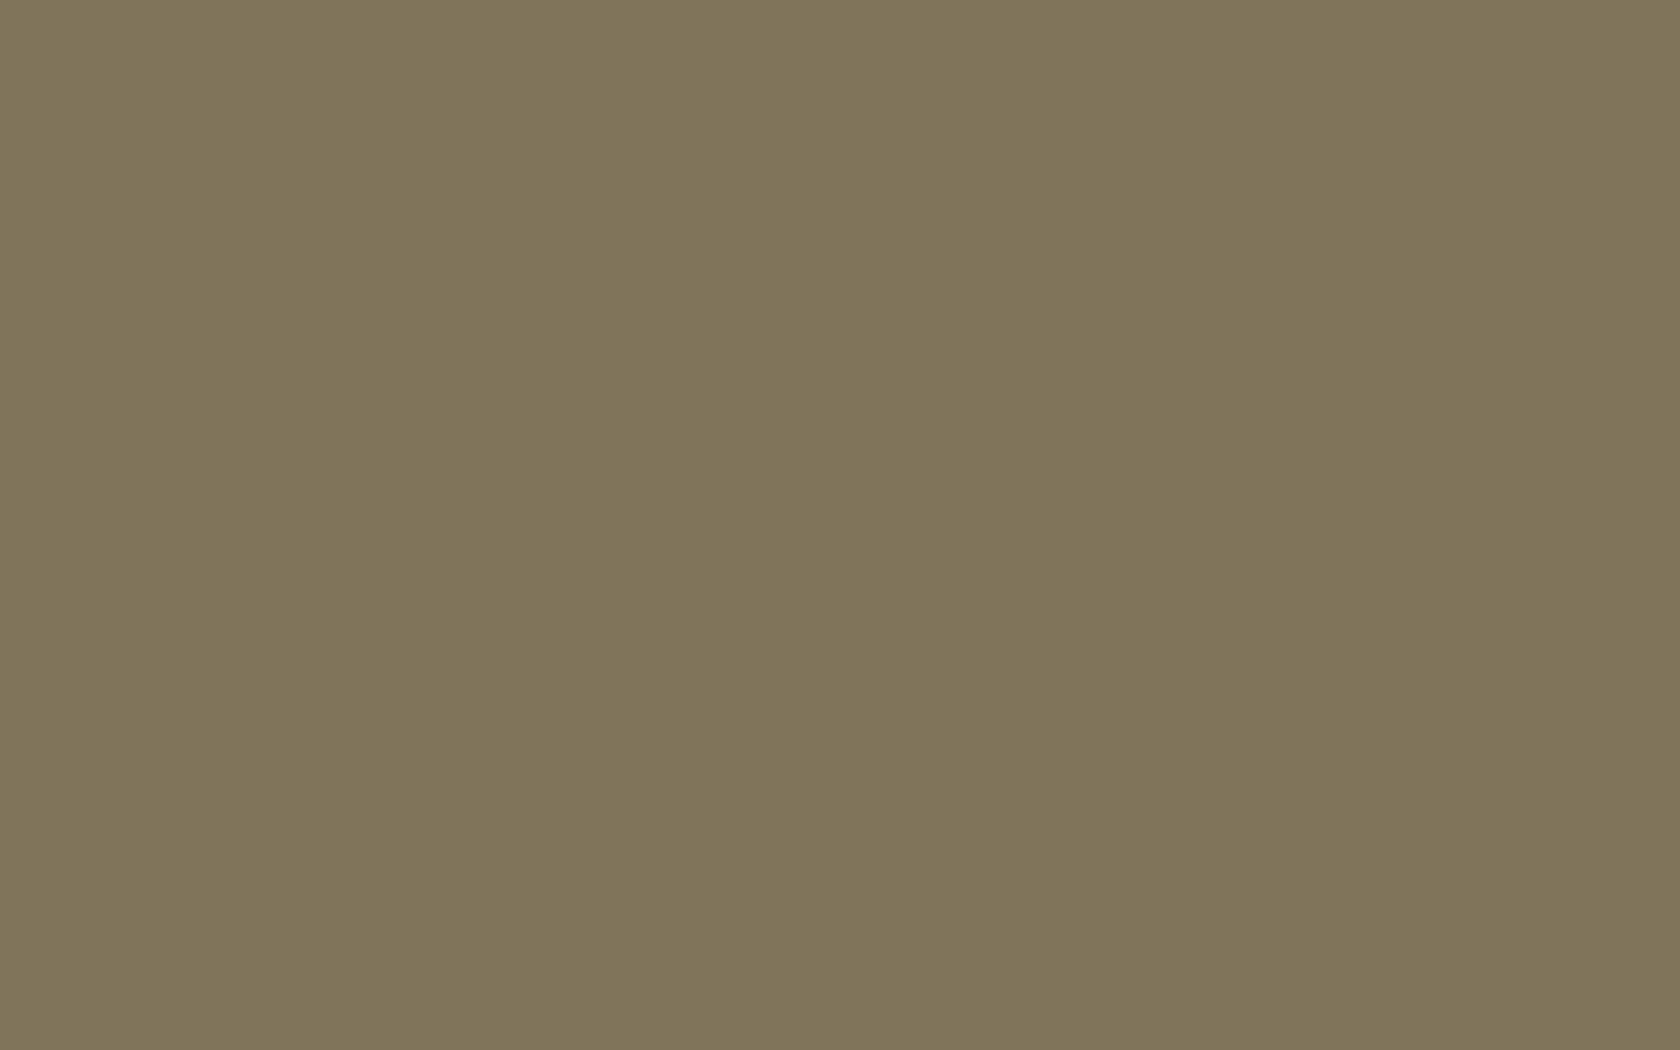 1680x1050 Spanish Bistre Solid Color Background